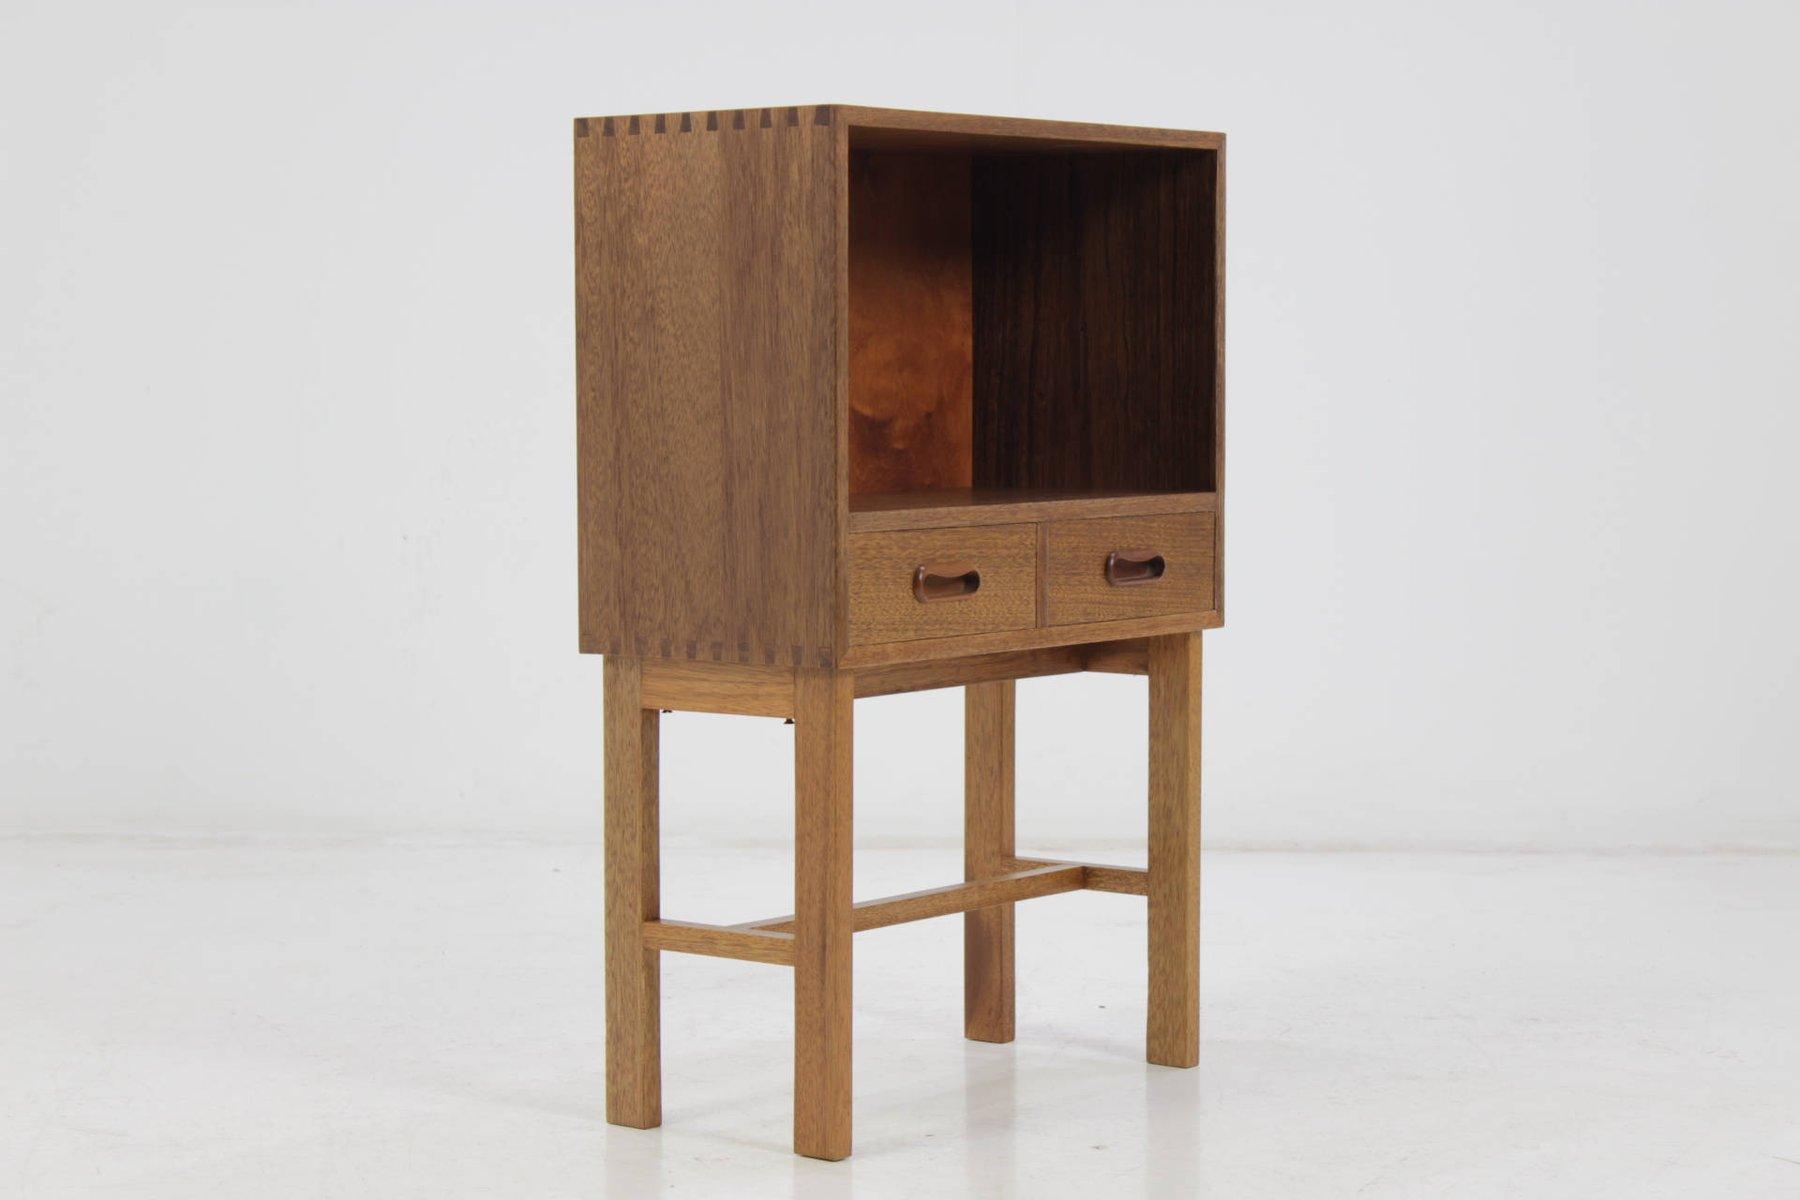 meuble en teck massif danemark 1960s en vente sur pamono. Black Bedroom Furniture Sets. Home Design Ideas